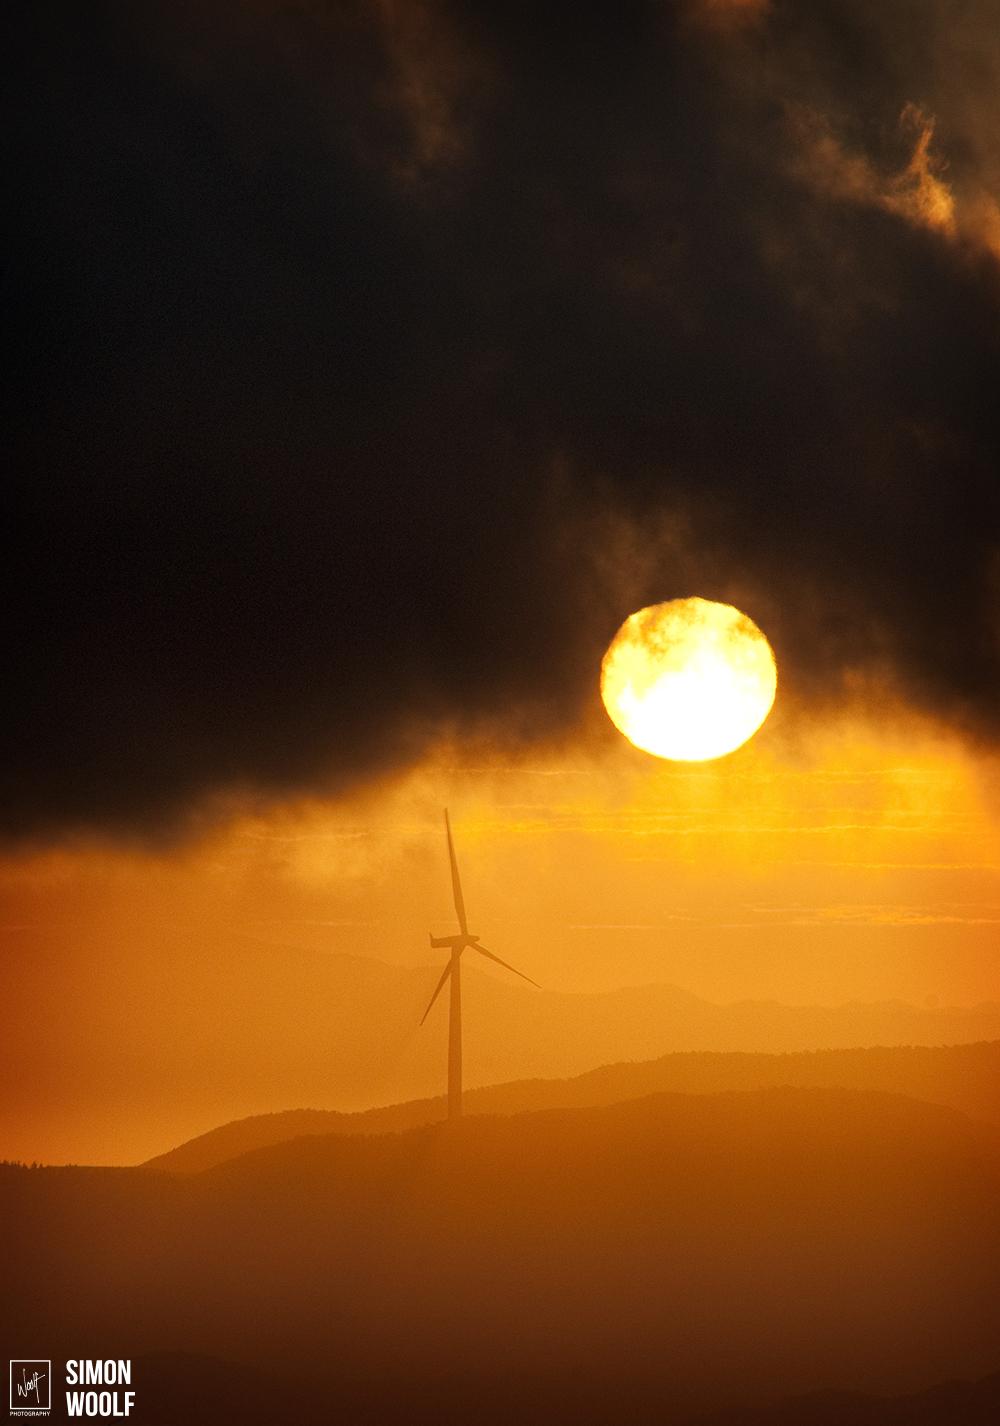 Sun and Turbine_3PW9407.jpg